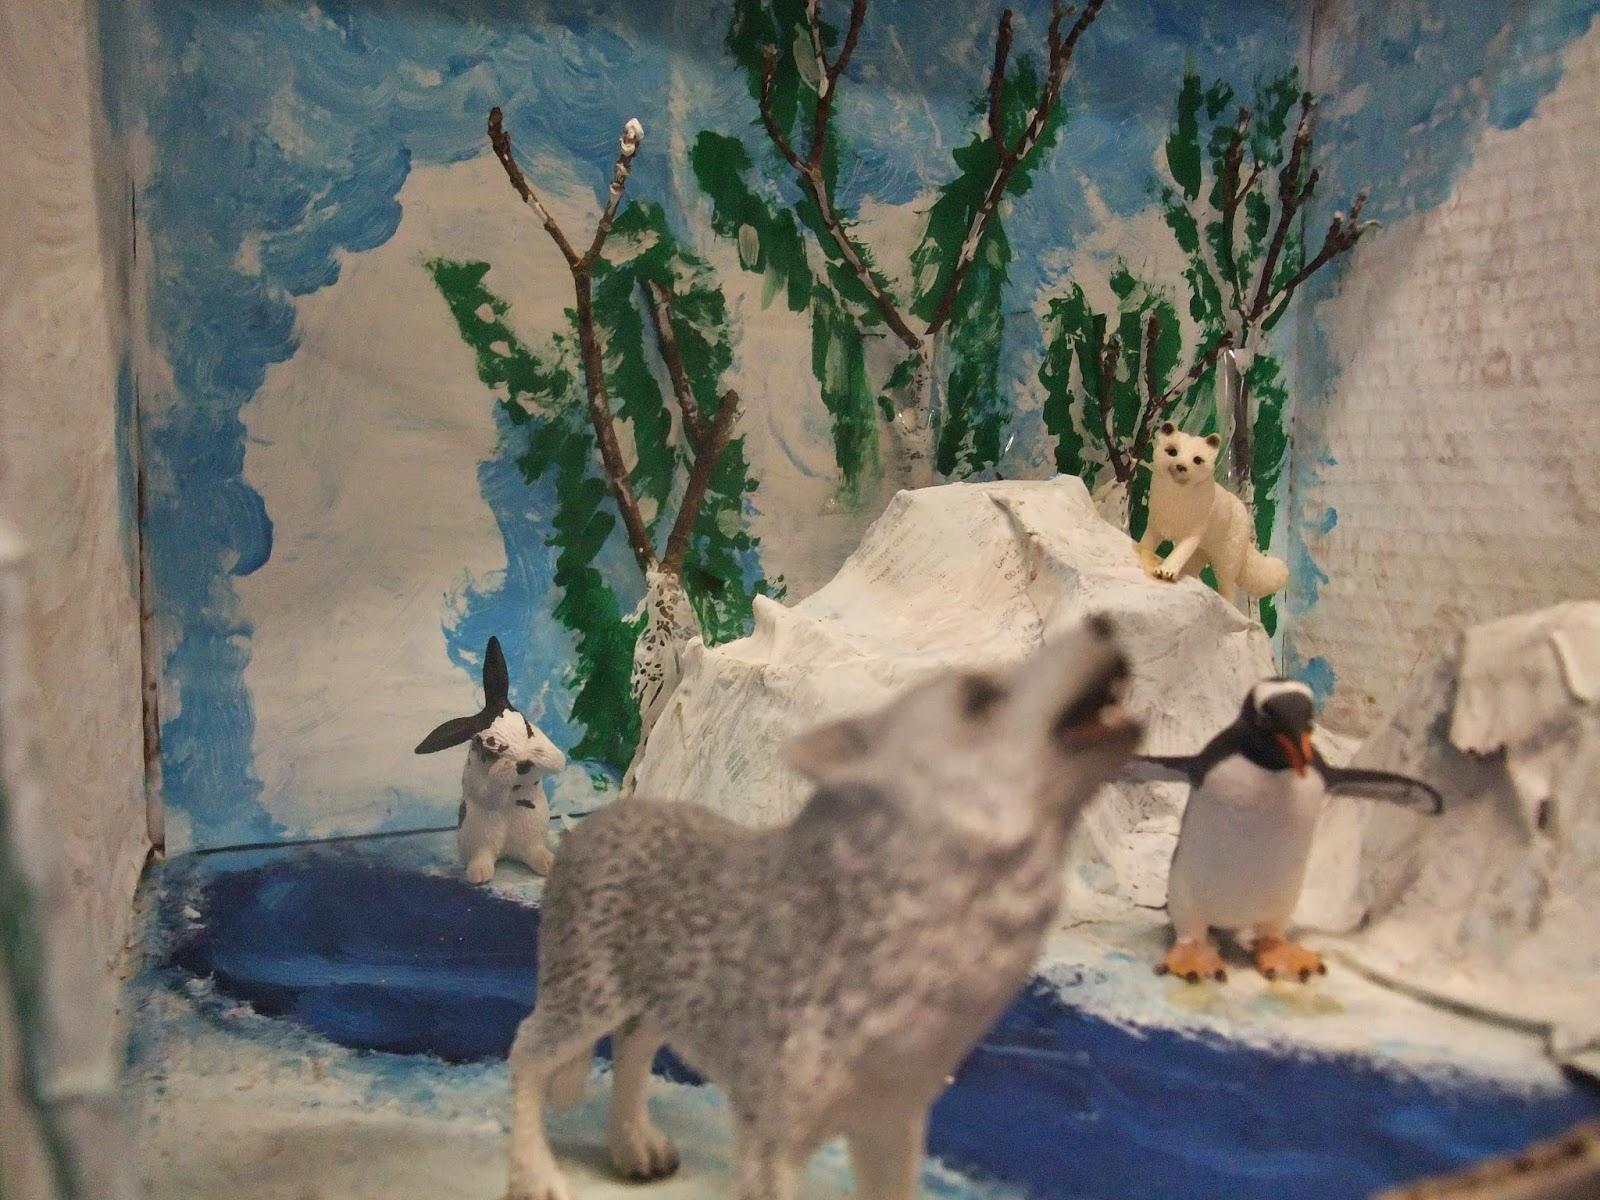 Arctic wolf diorama - photo#6